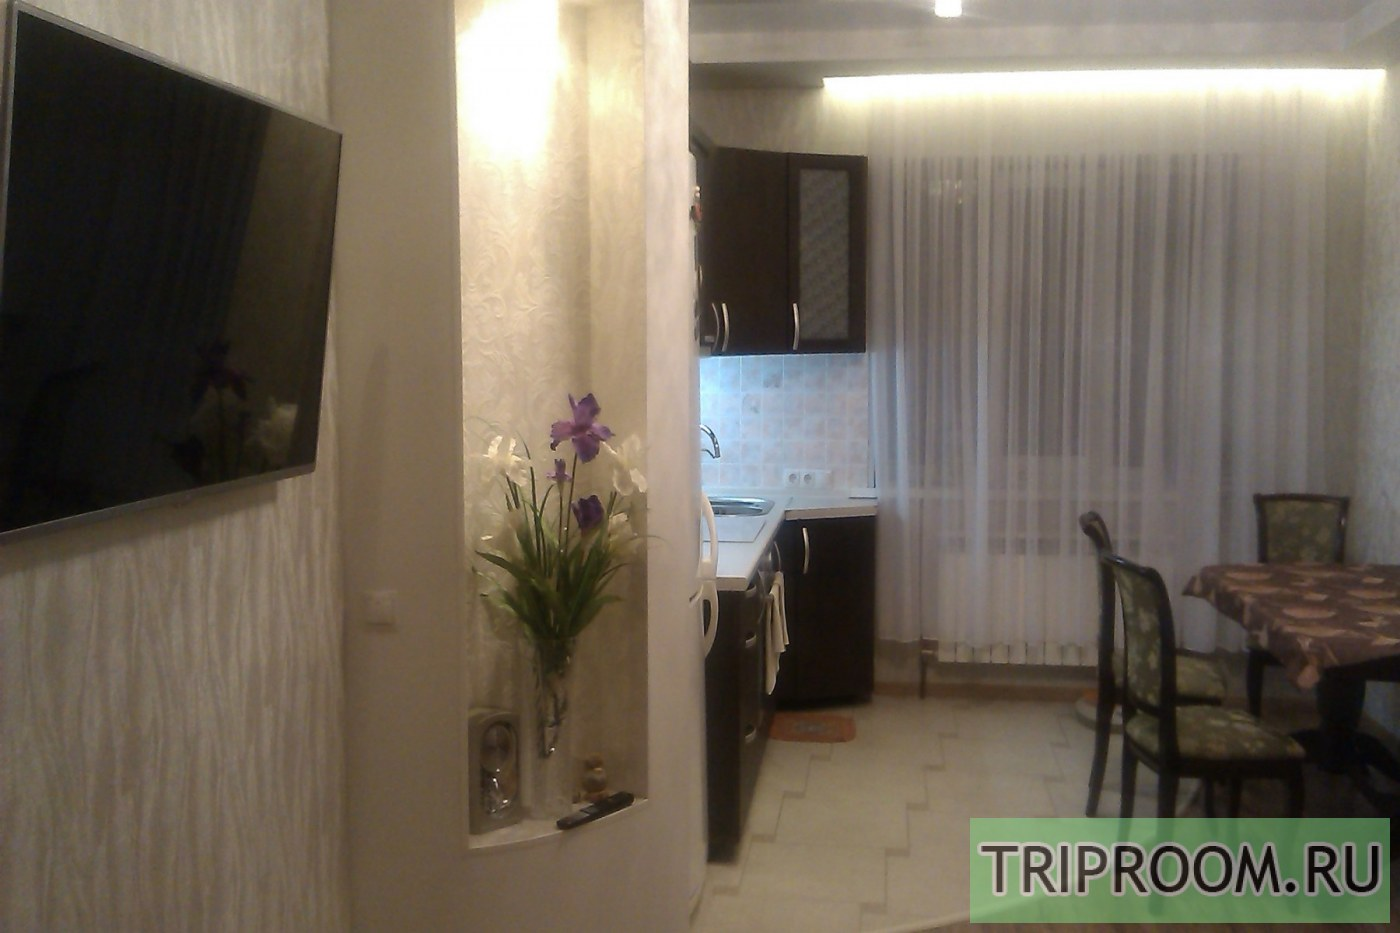 3-комнатная квартира посуточно (вариант № 39631), ул. Кирова улица, фото № 11